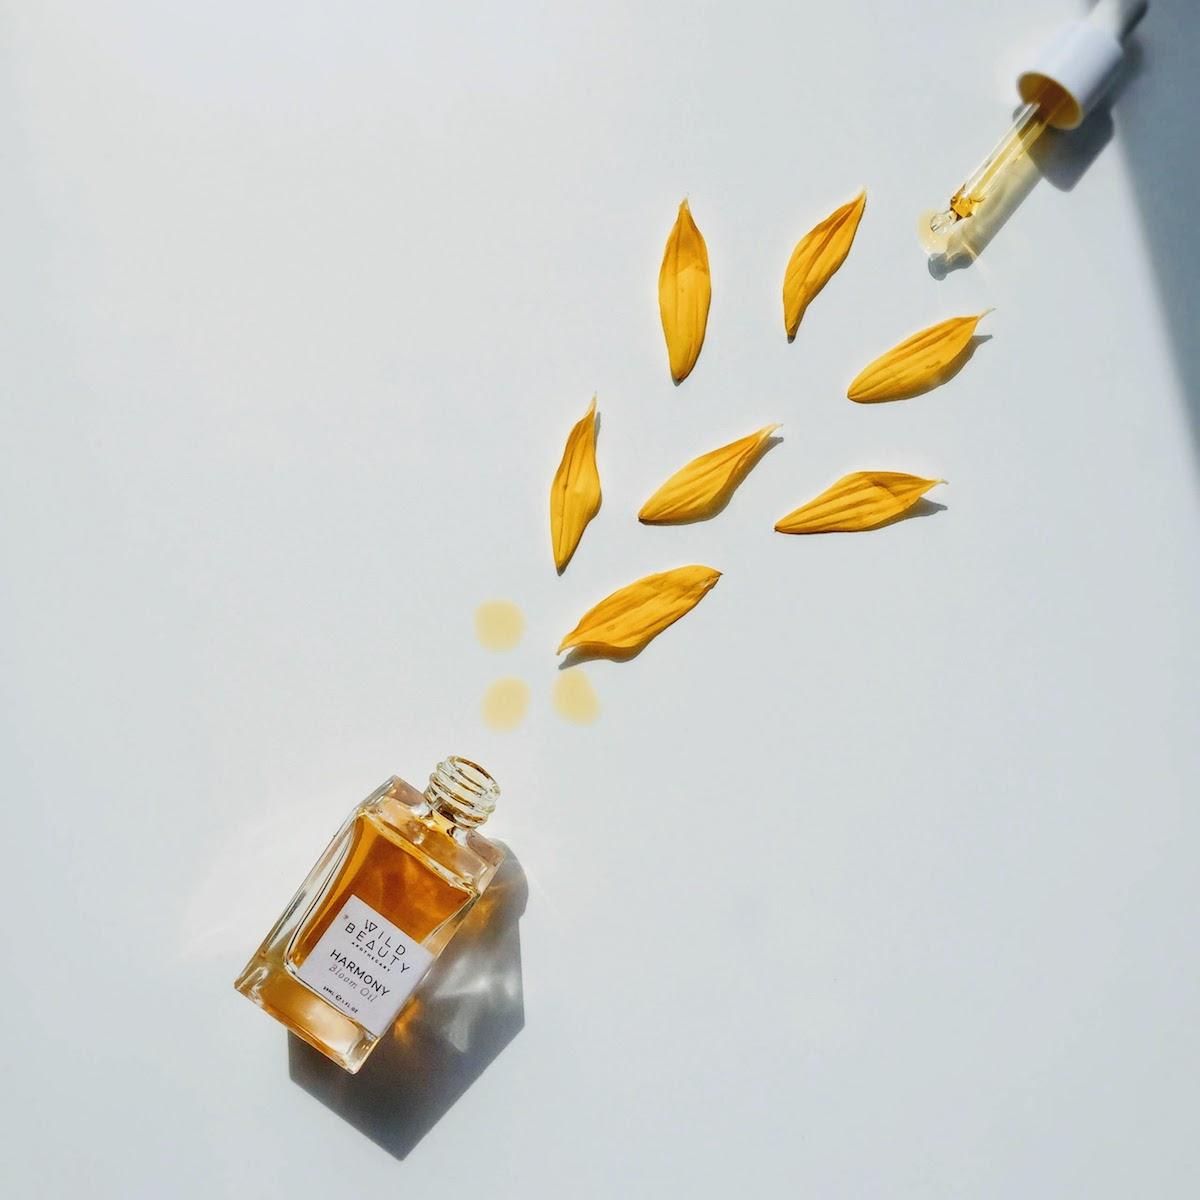 Lena Wild Harmony Bloom Oil review